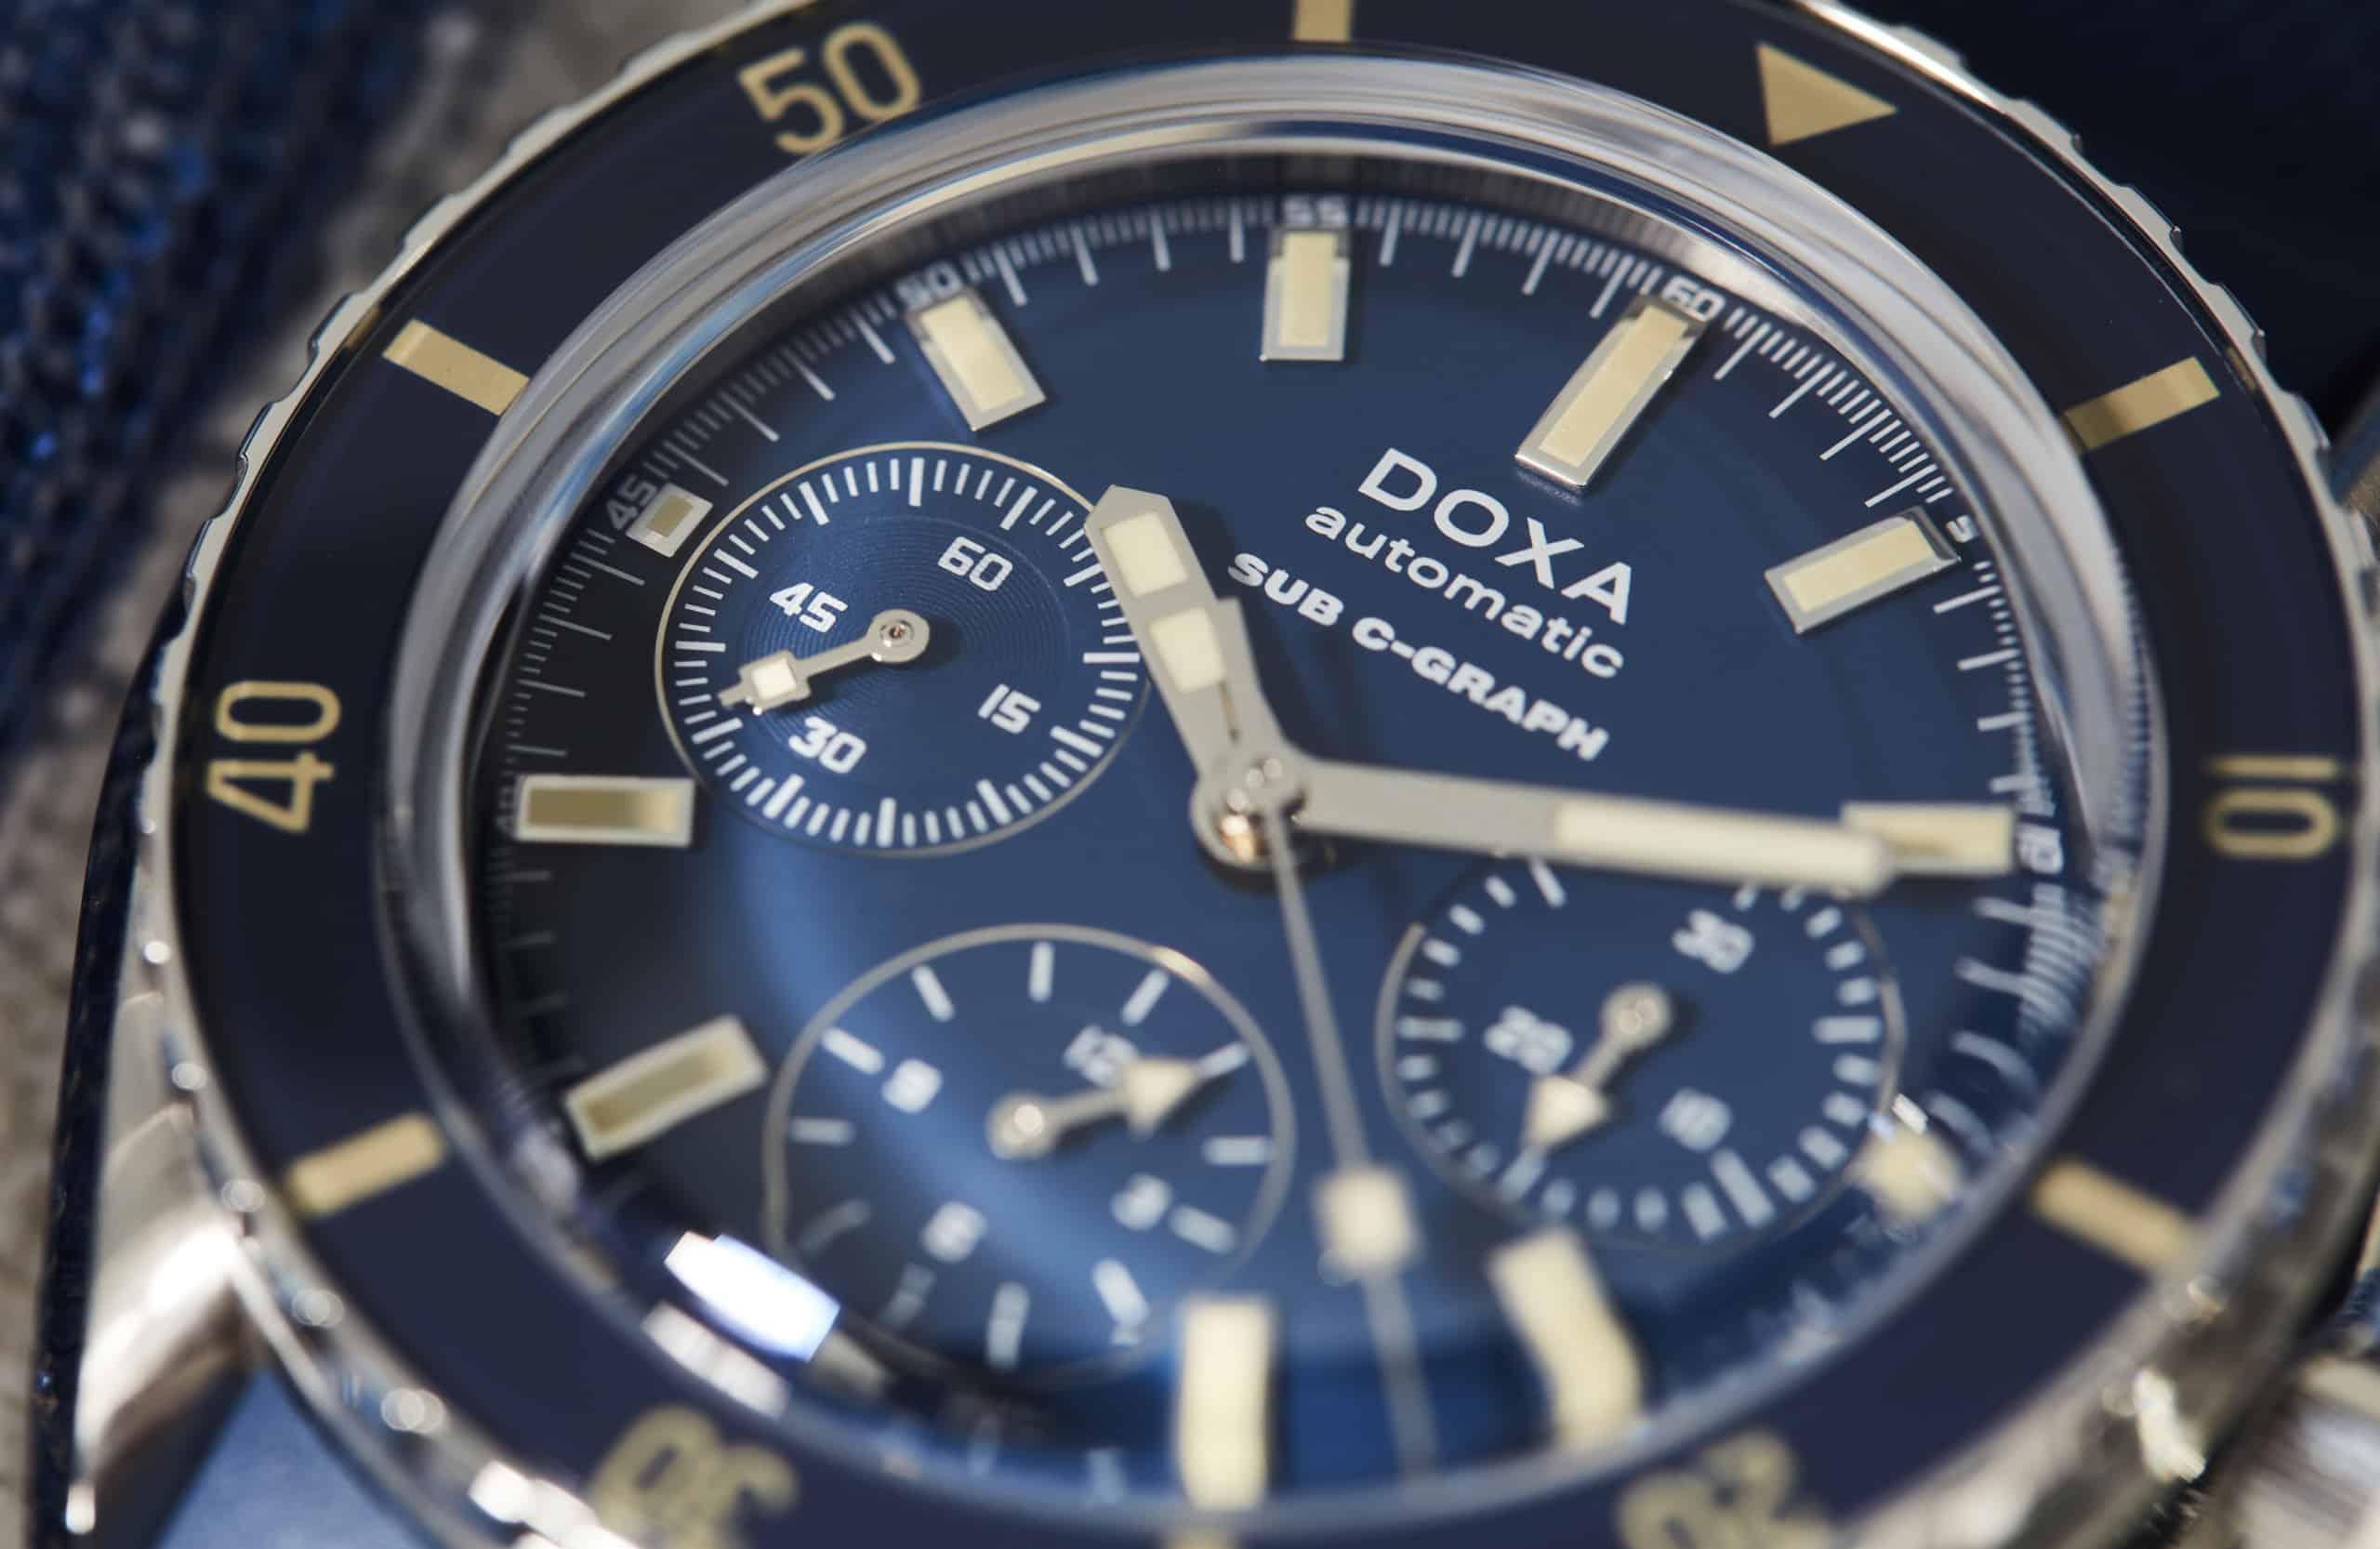 Doxa-Sub-C-Graph-55505-navy-7781-scaled.jpg